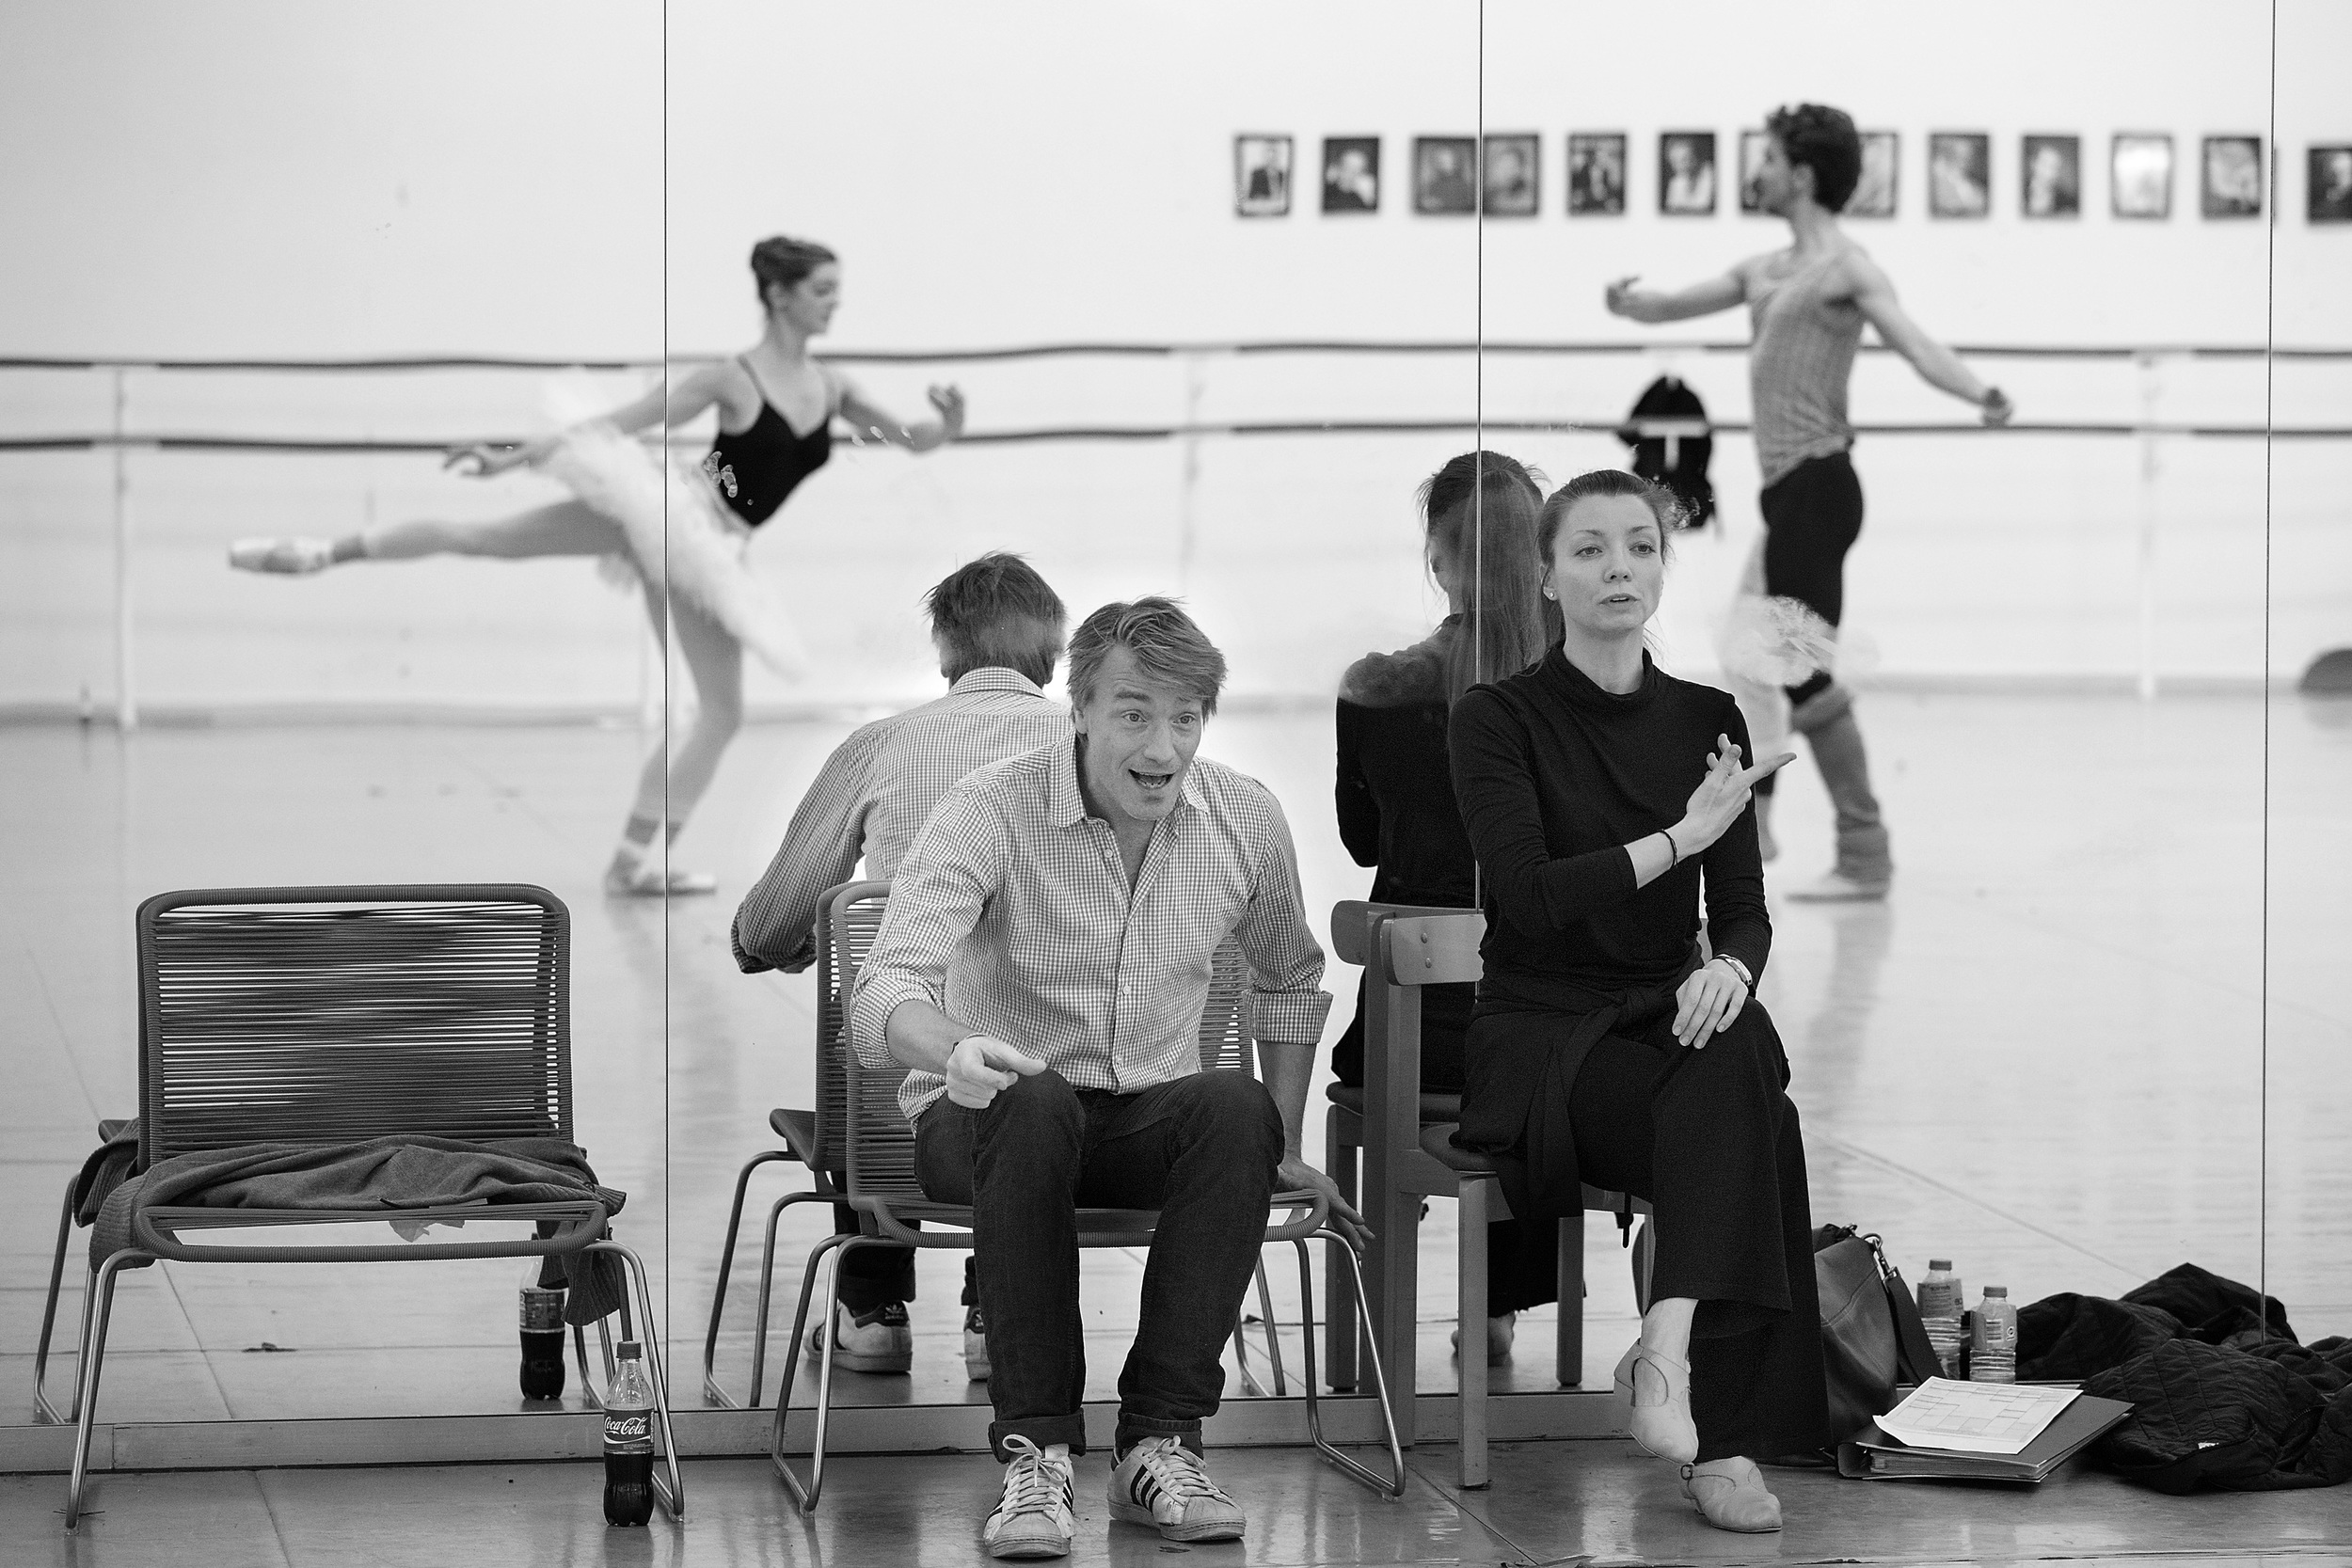 The Royal Danish Ballet